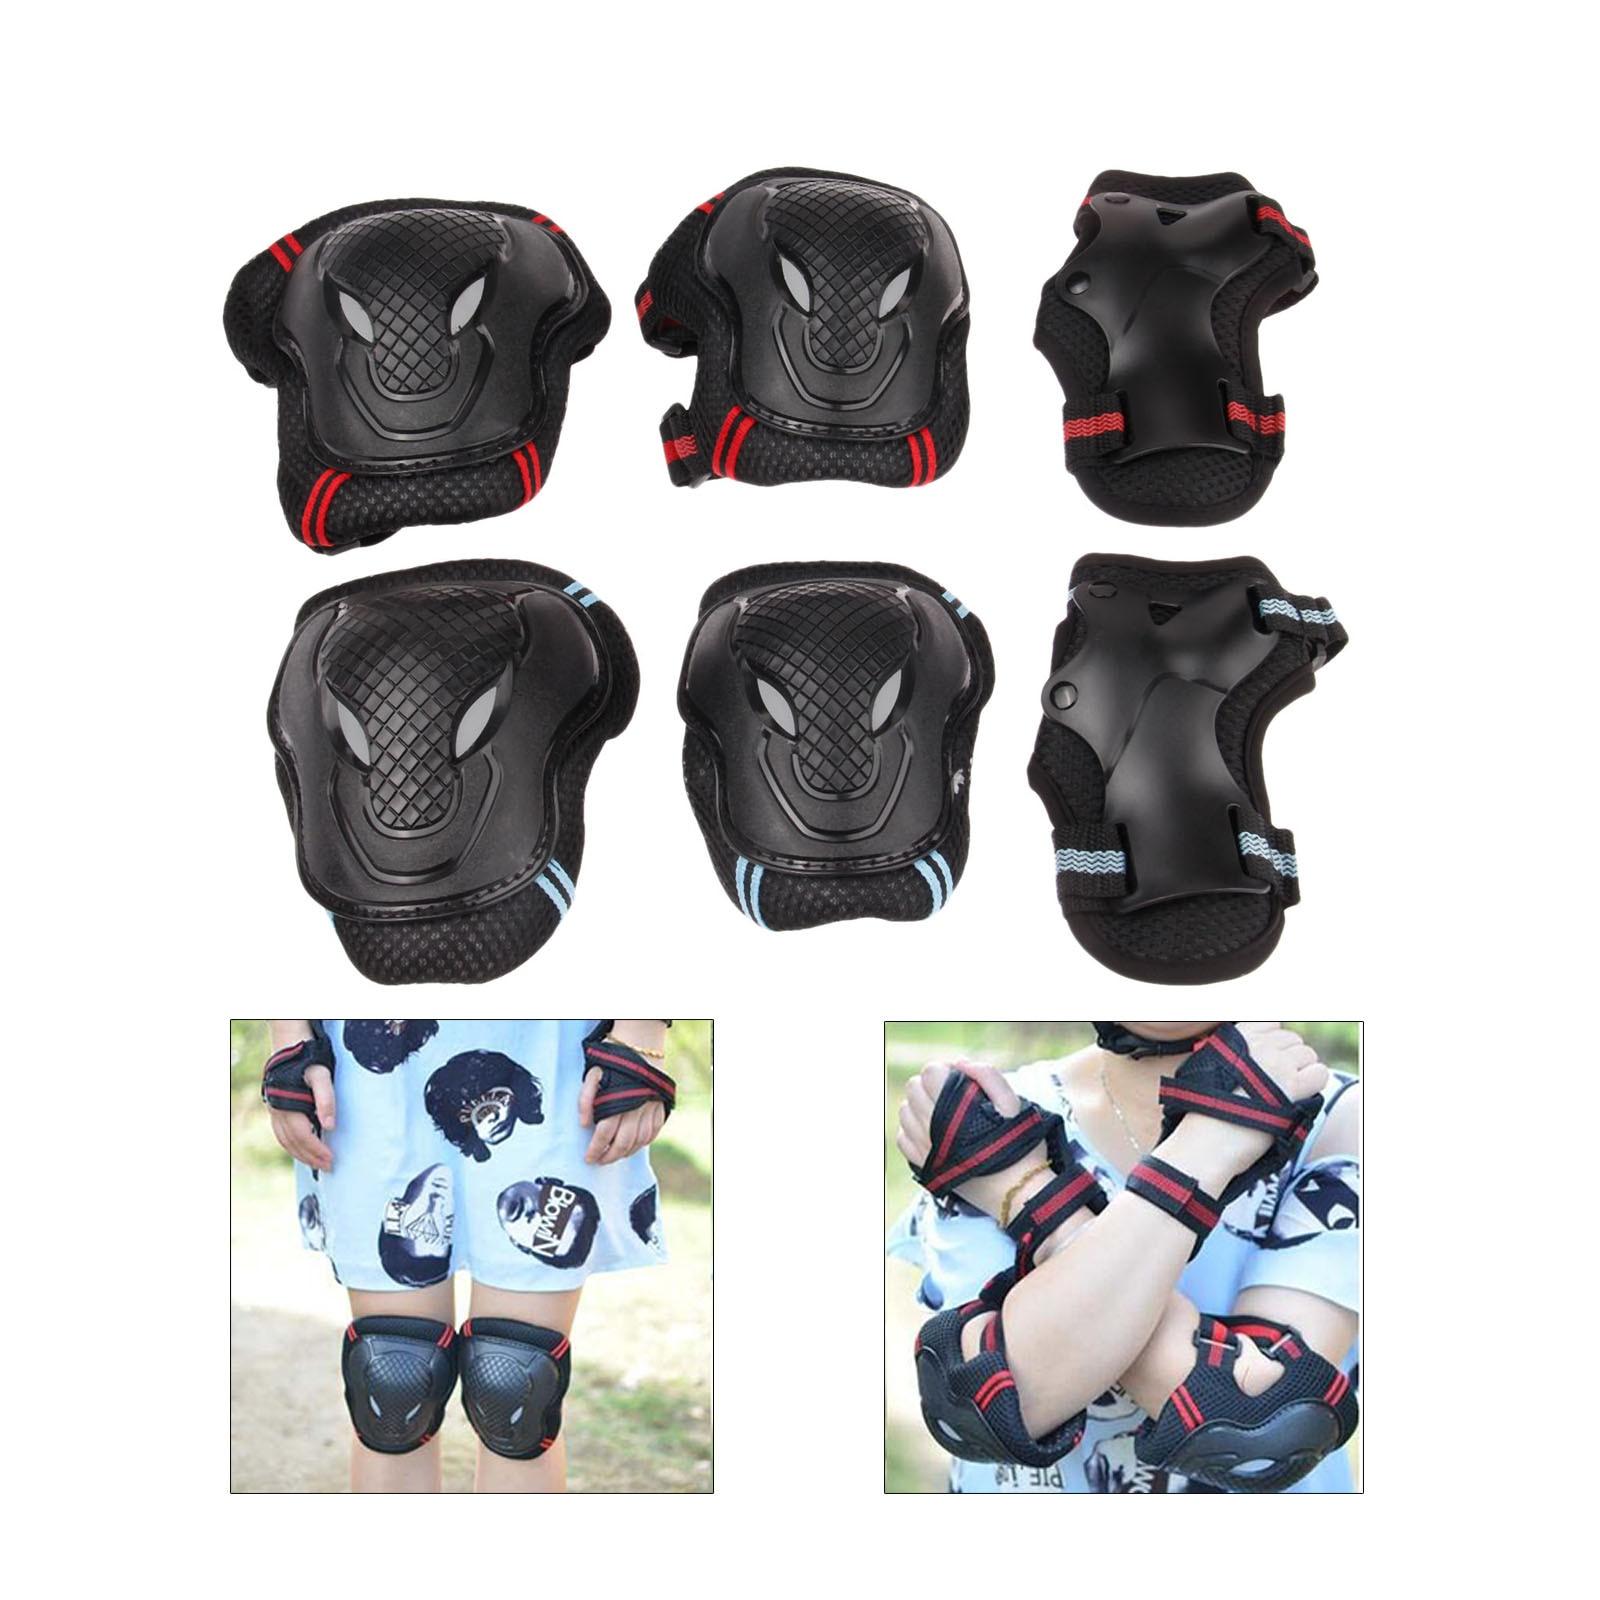 Roller Skates Skateboarding Skiing Wrist Knee Elbow Protector Set Adult Kids KneePads Protection 6 in1 Set Sports Safety Guard